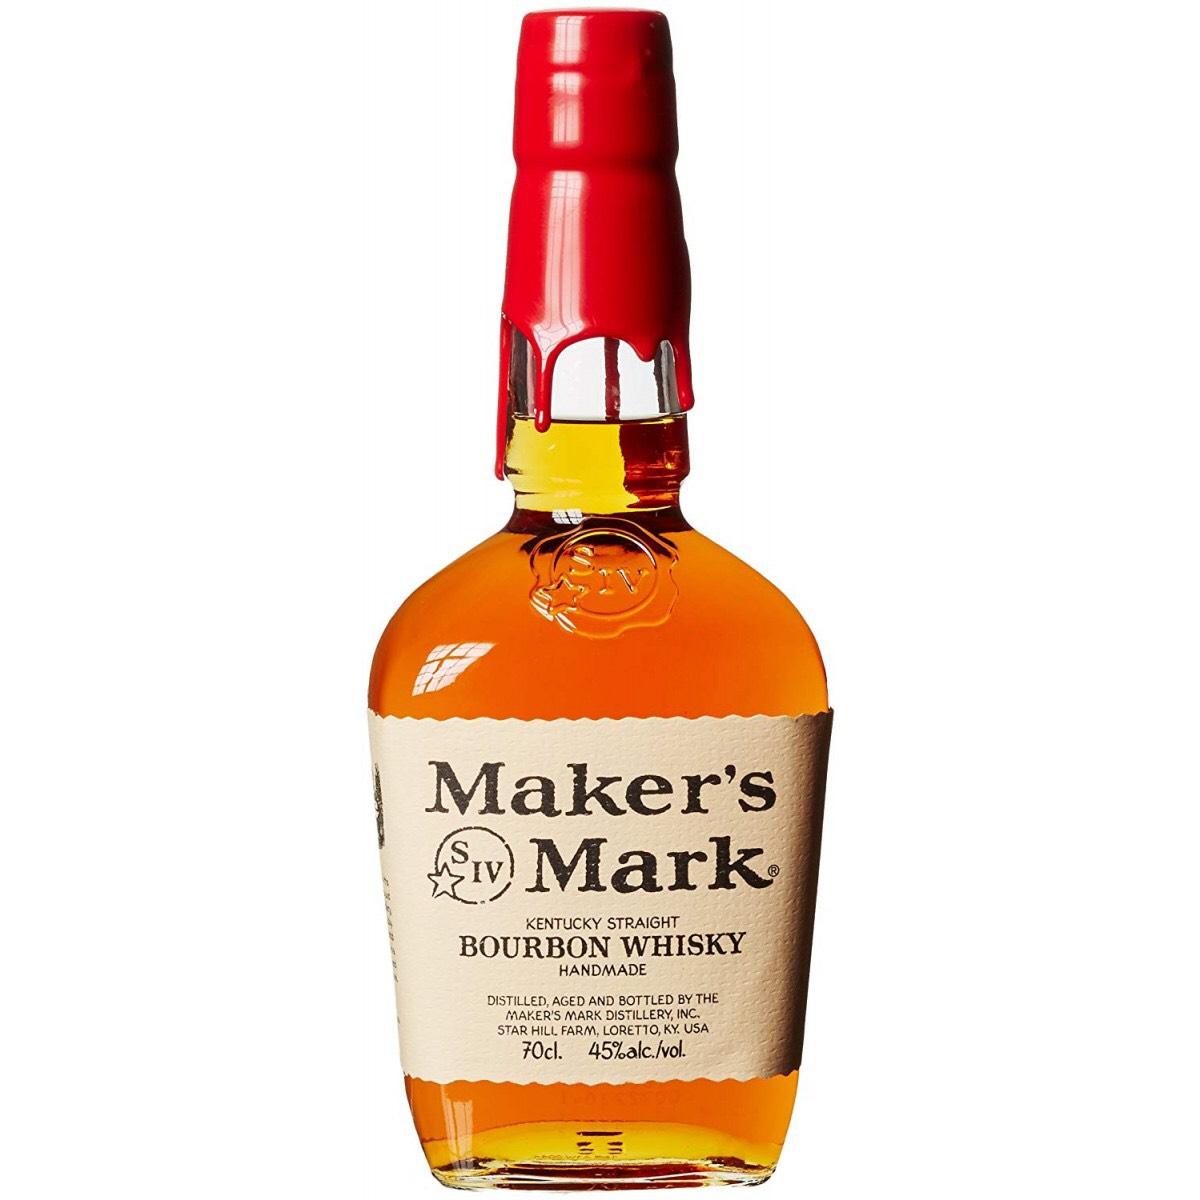 2x Maker's Mark Kentucky Straight Bourbon Whisky